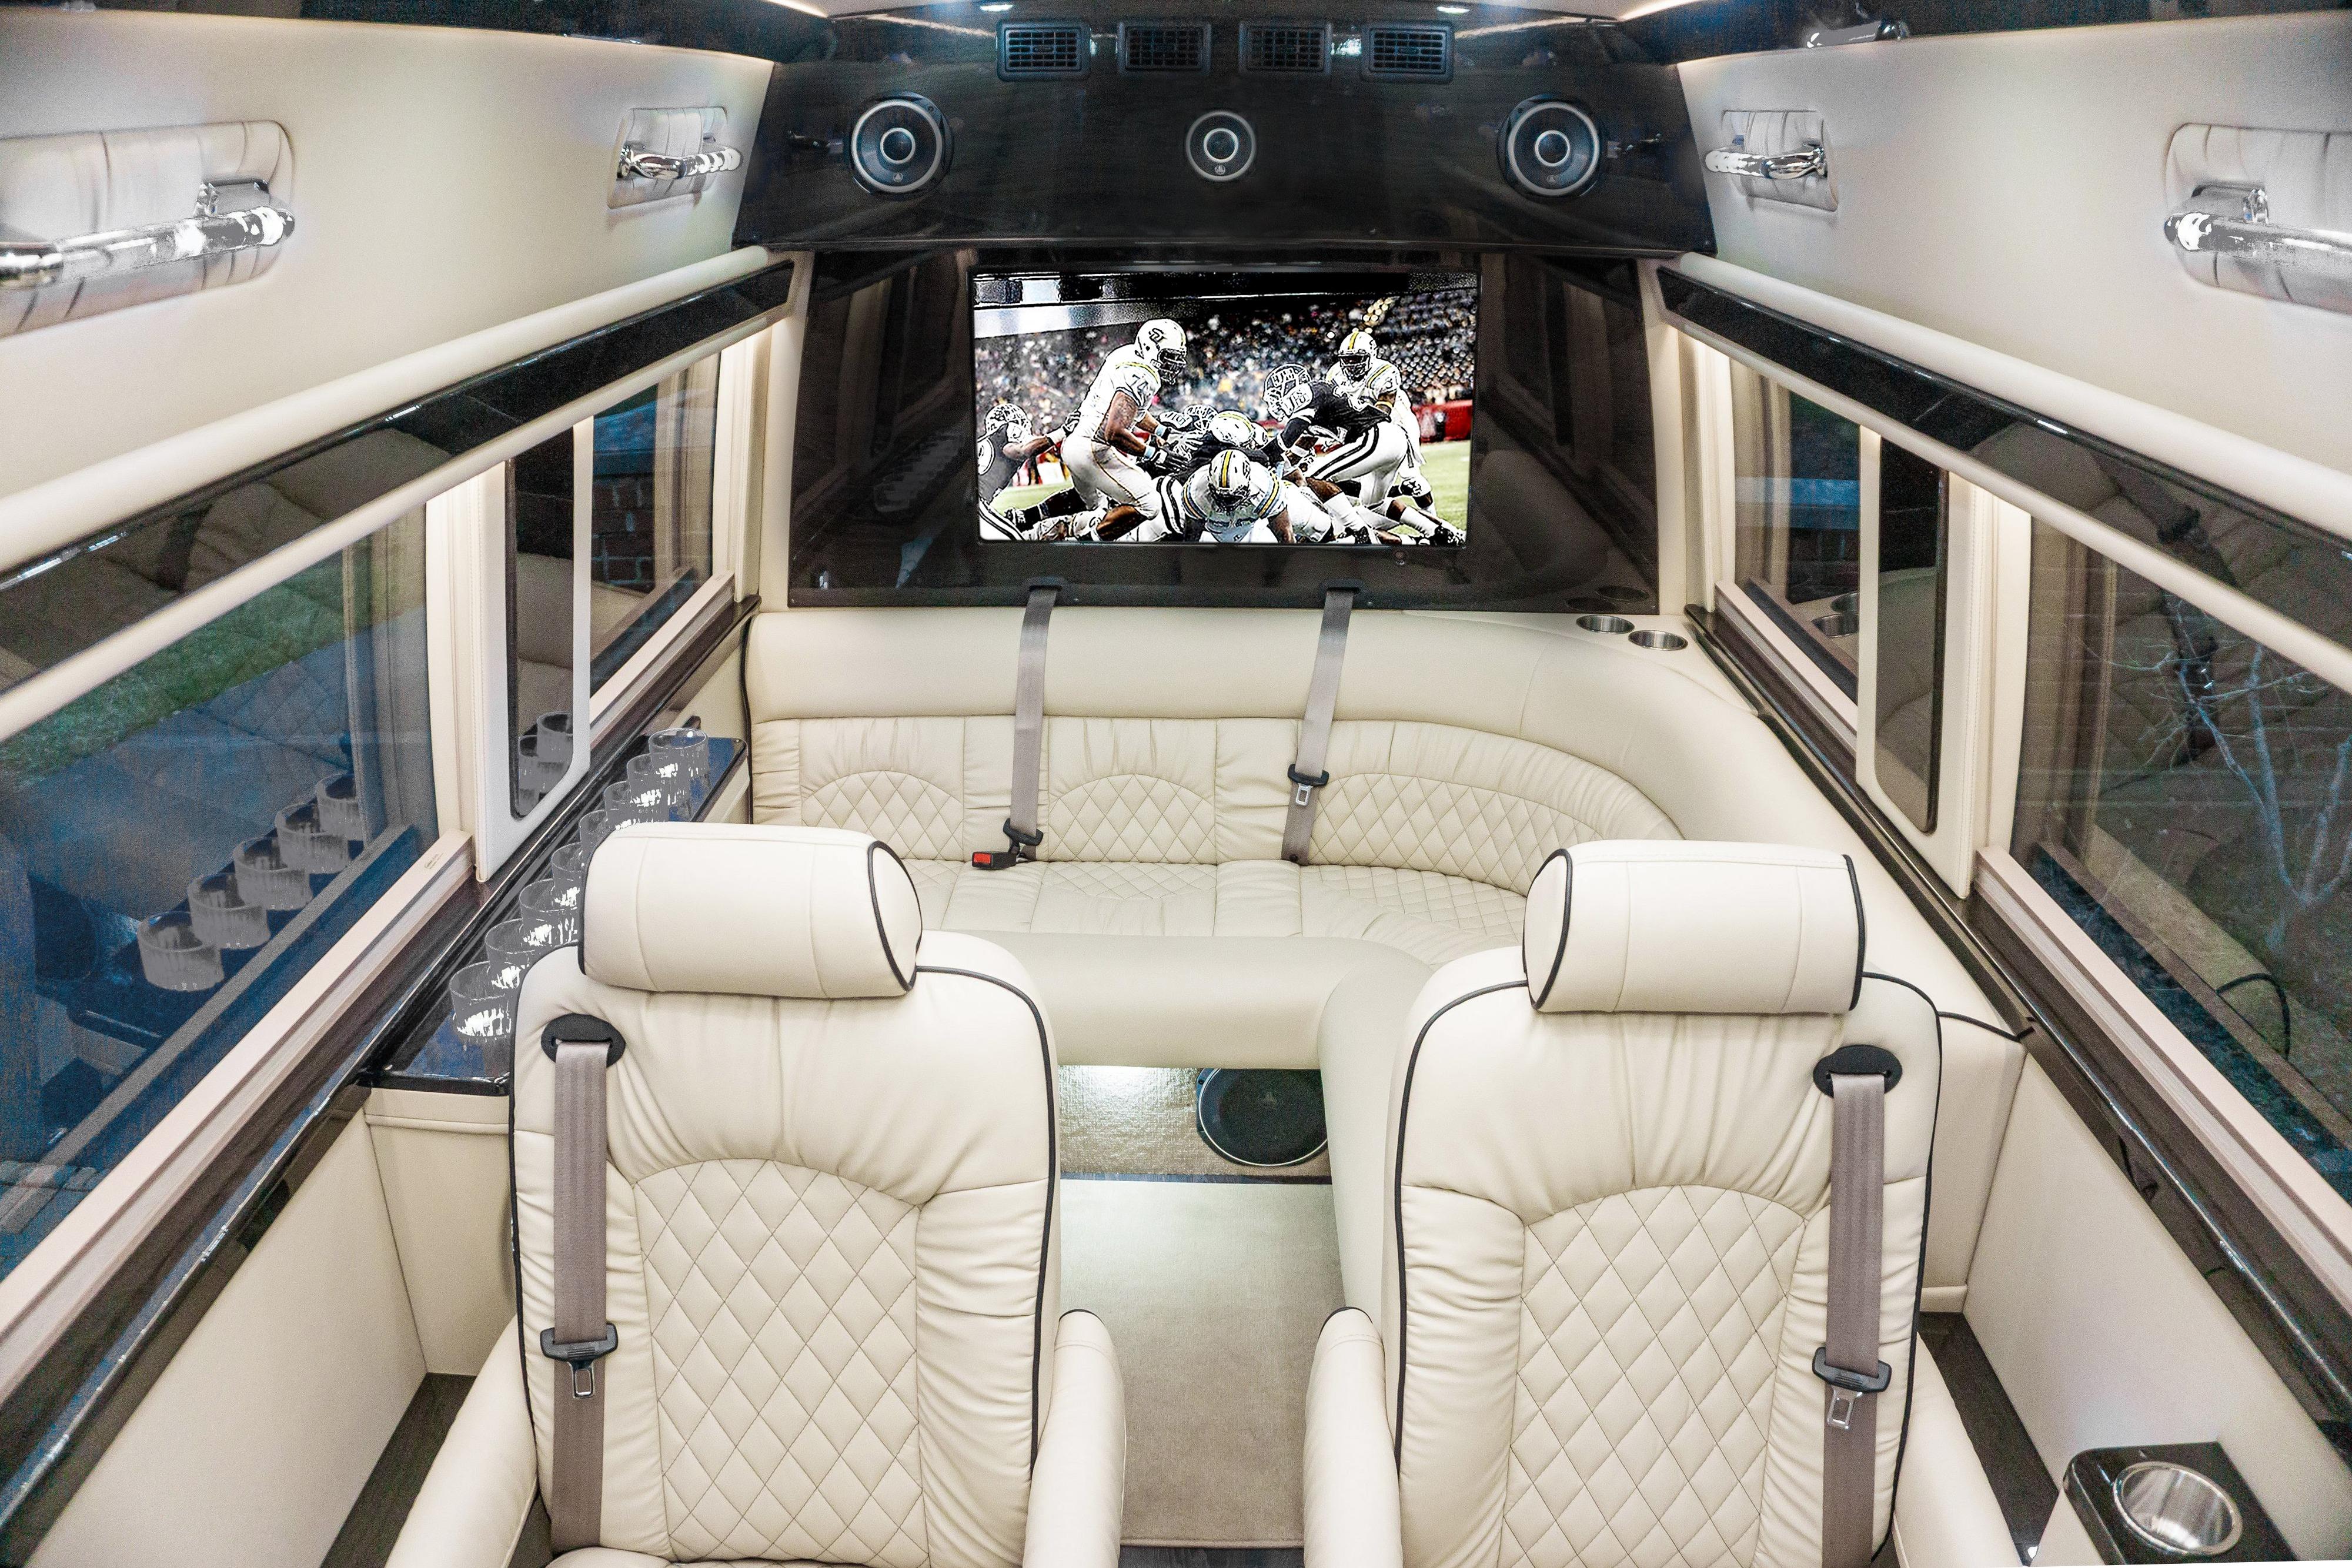 Mercedes Sprinter 3500 luxury limo 2019